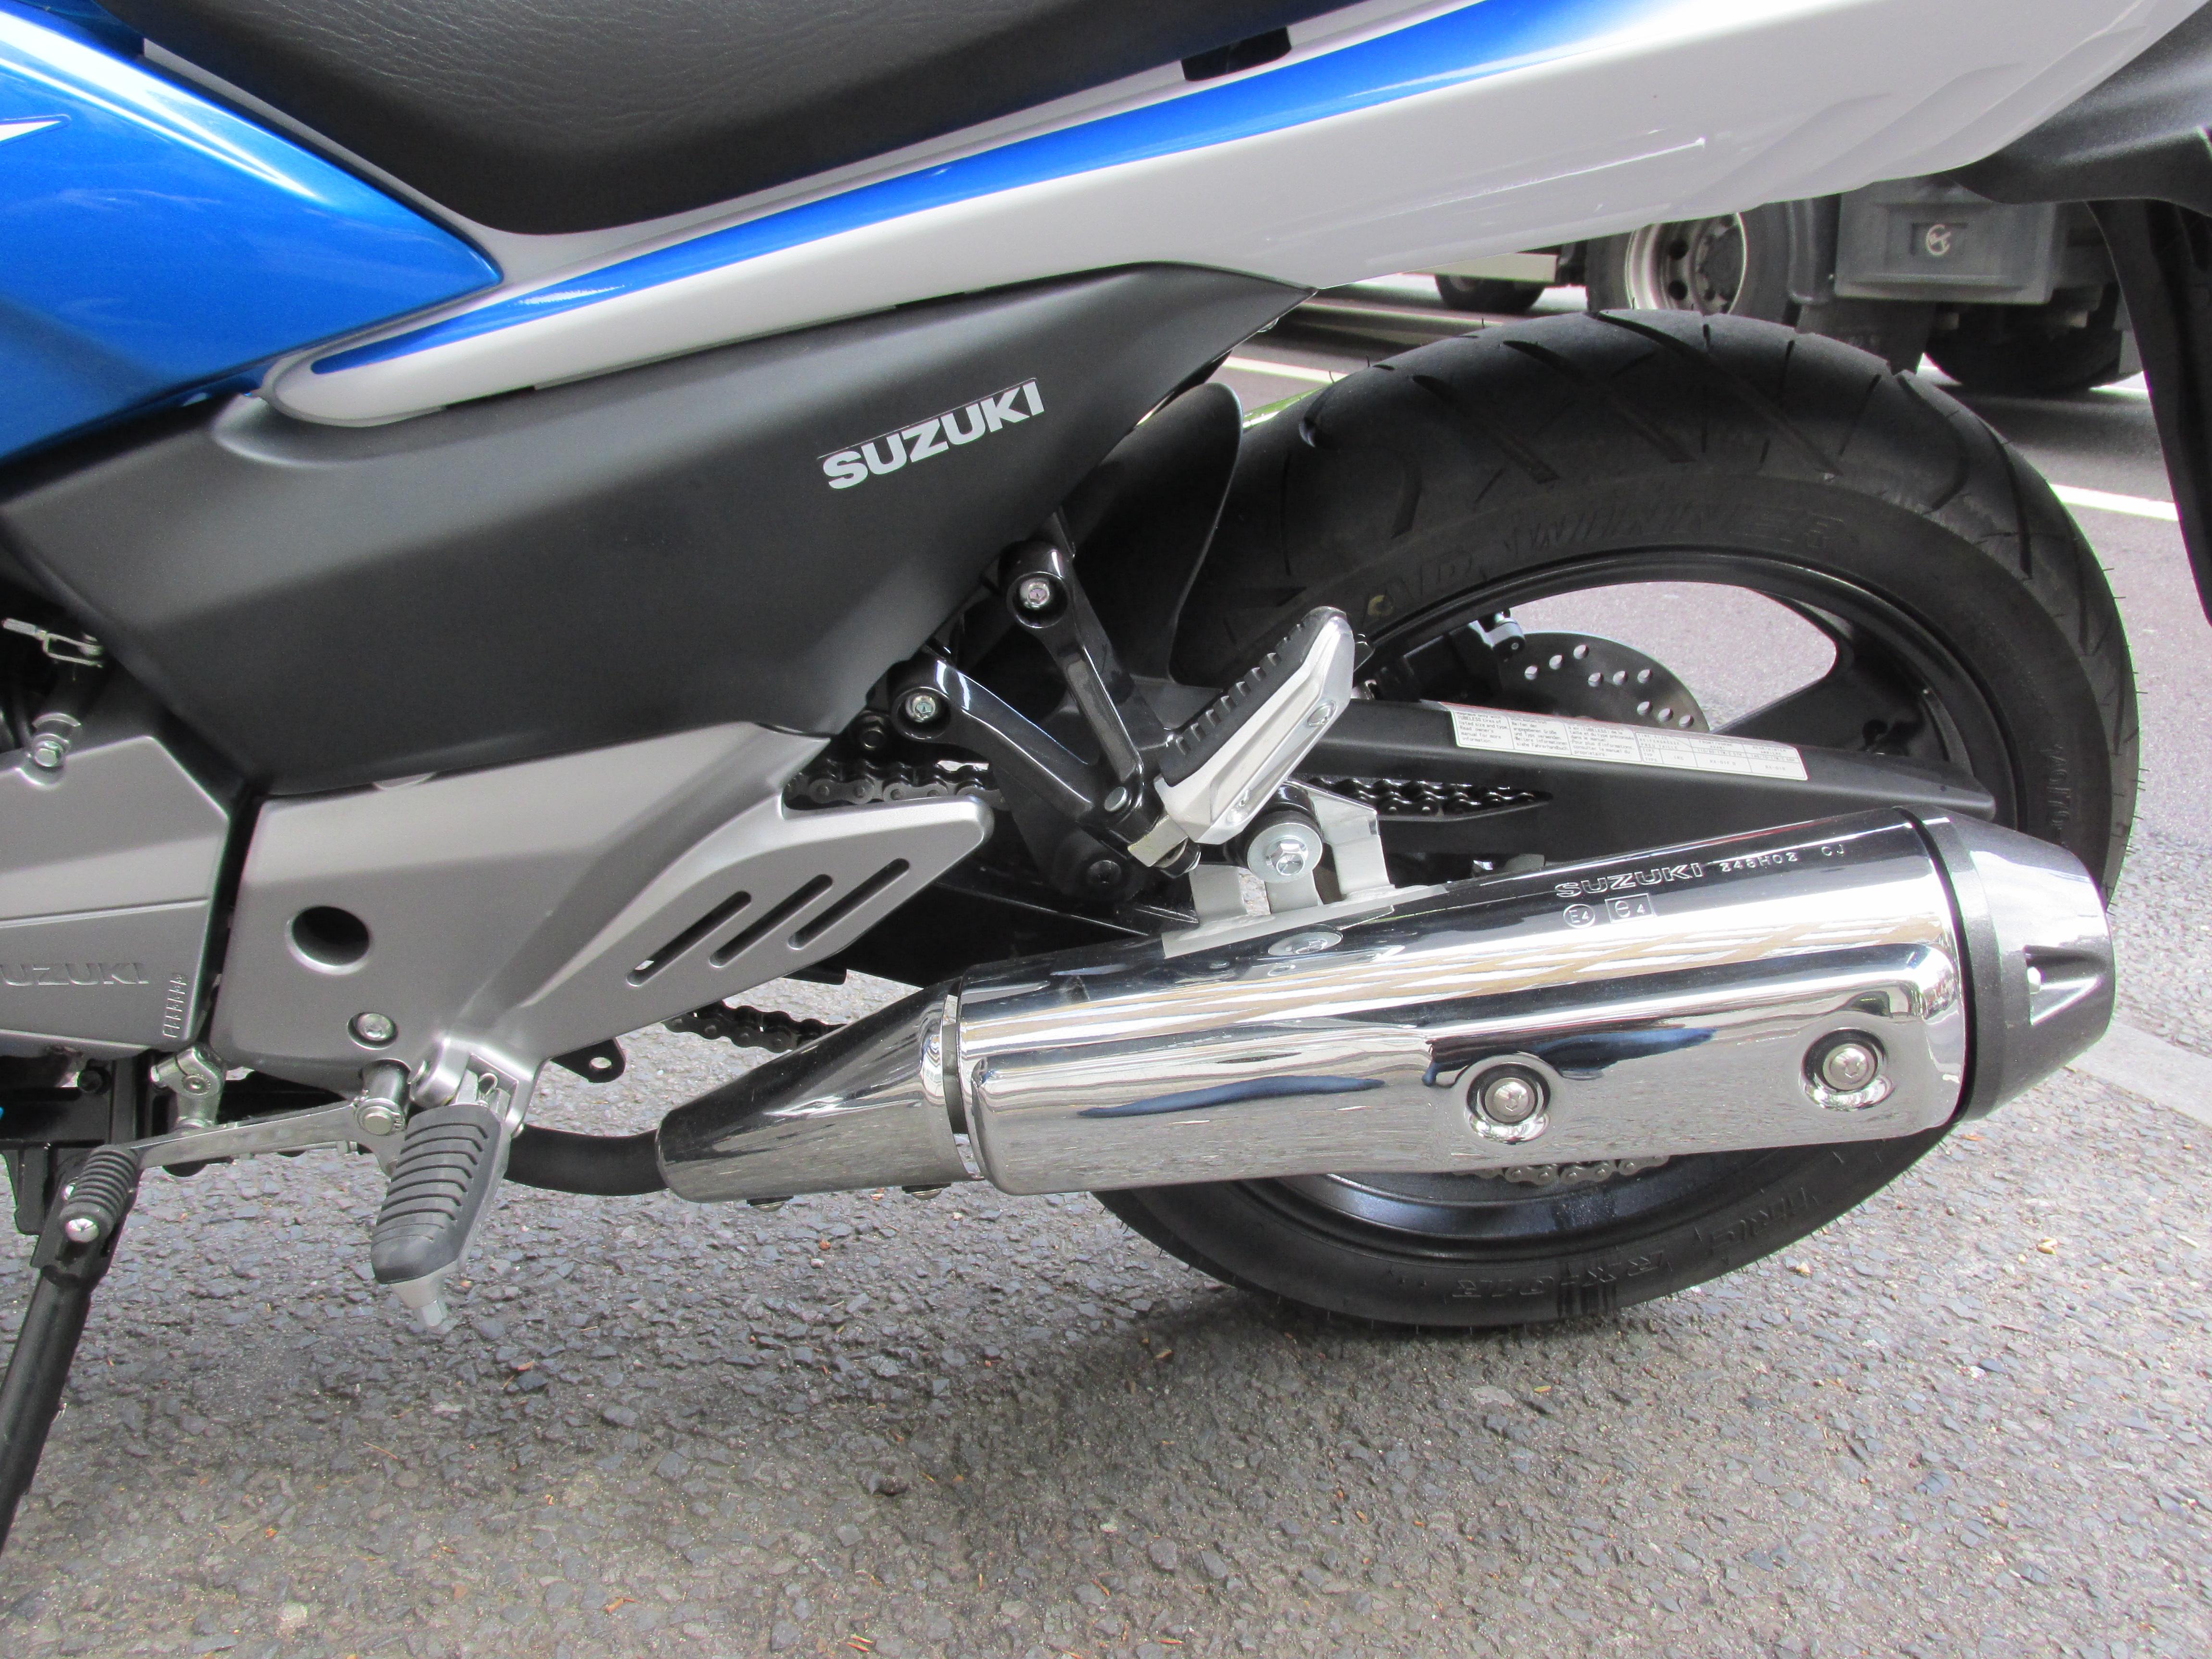 First ride: Suzuki Inazuma 250F